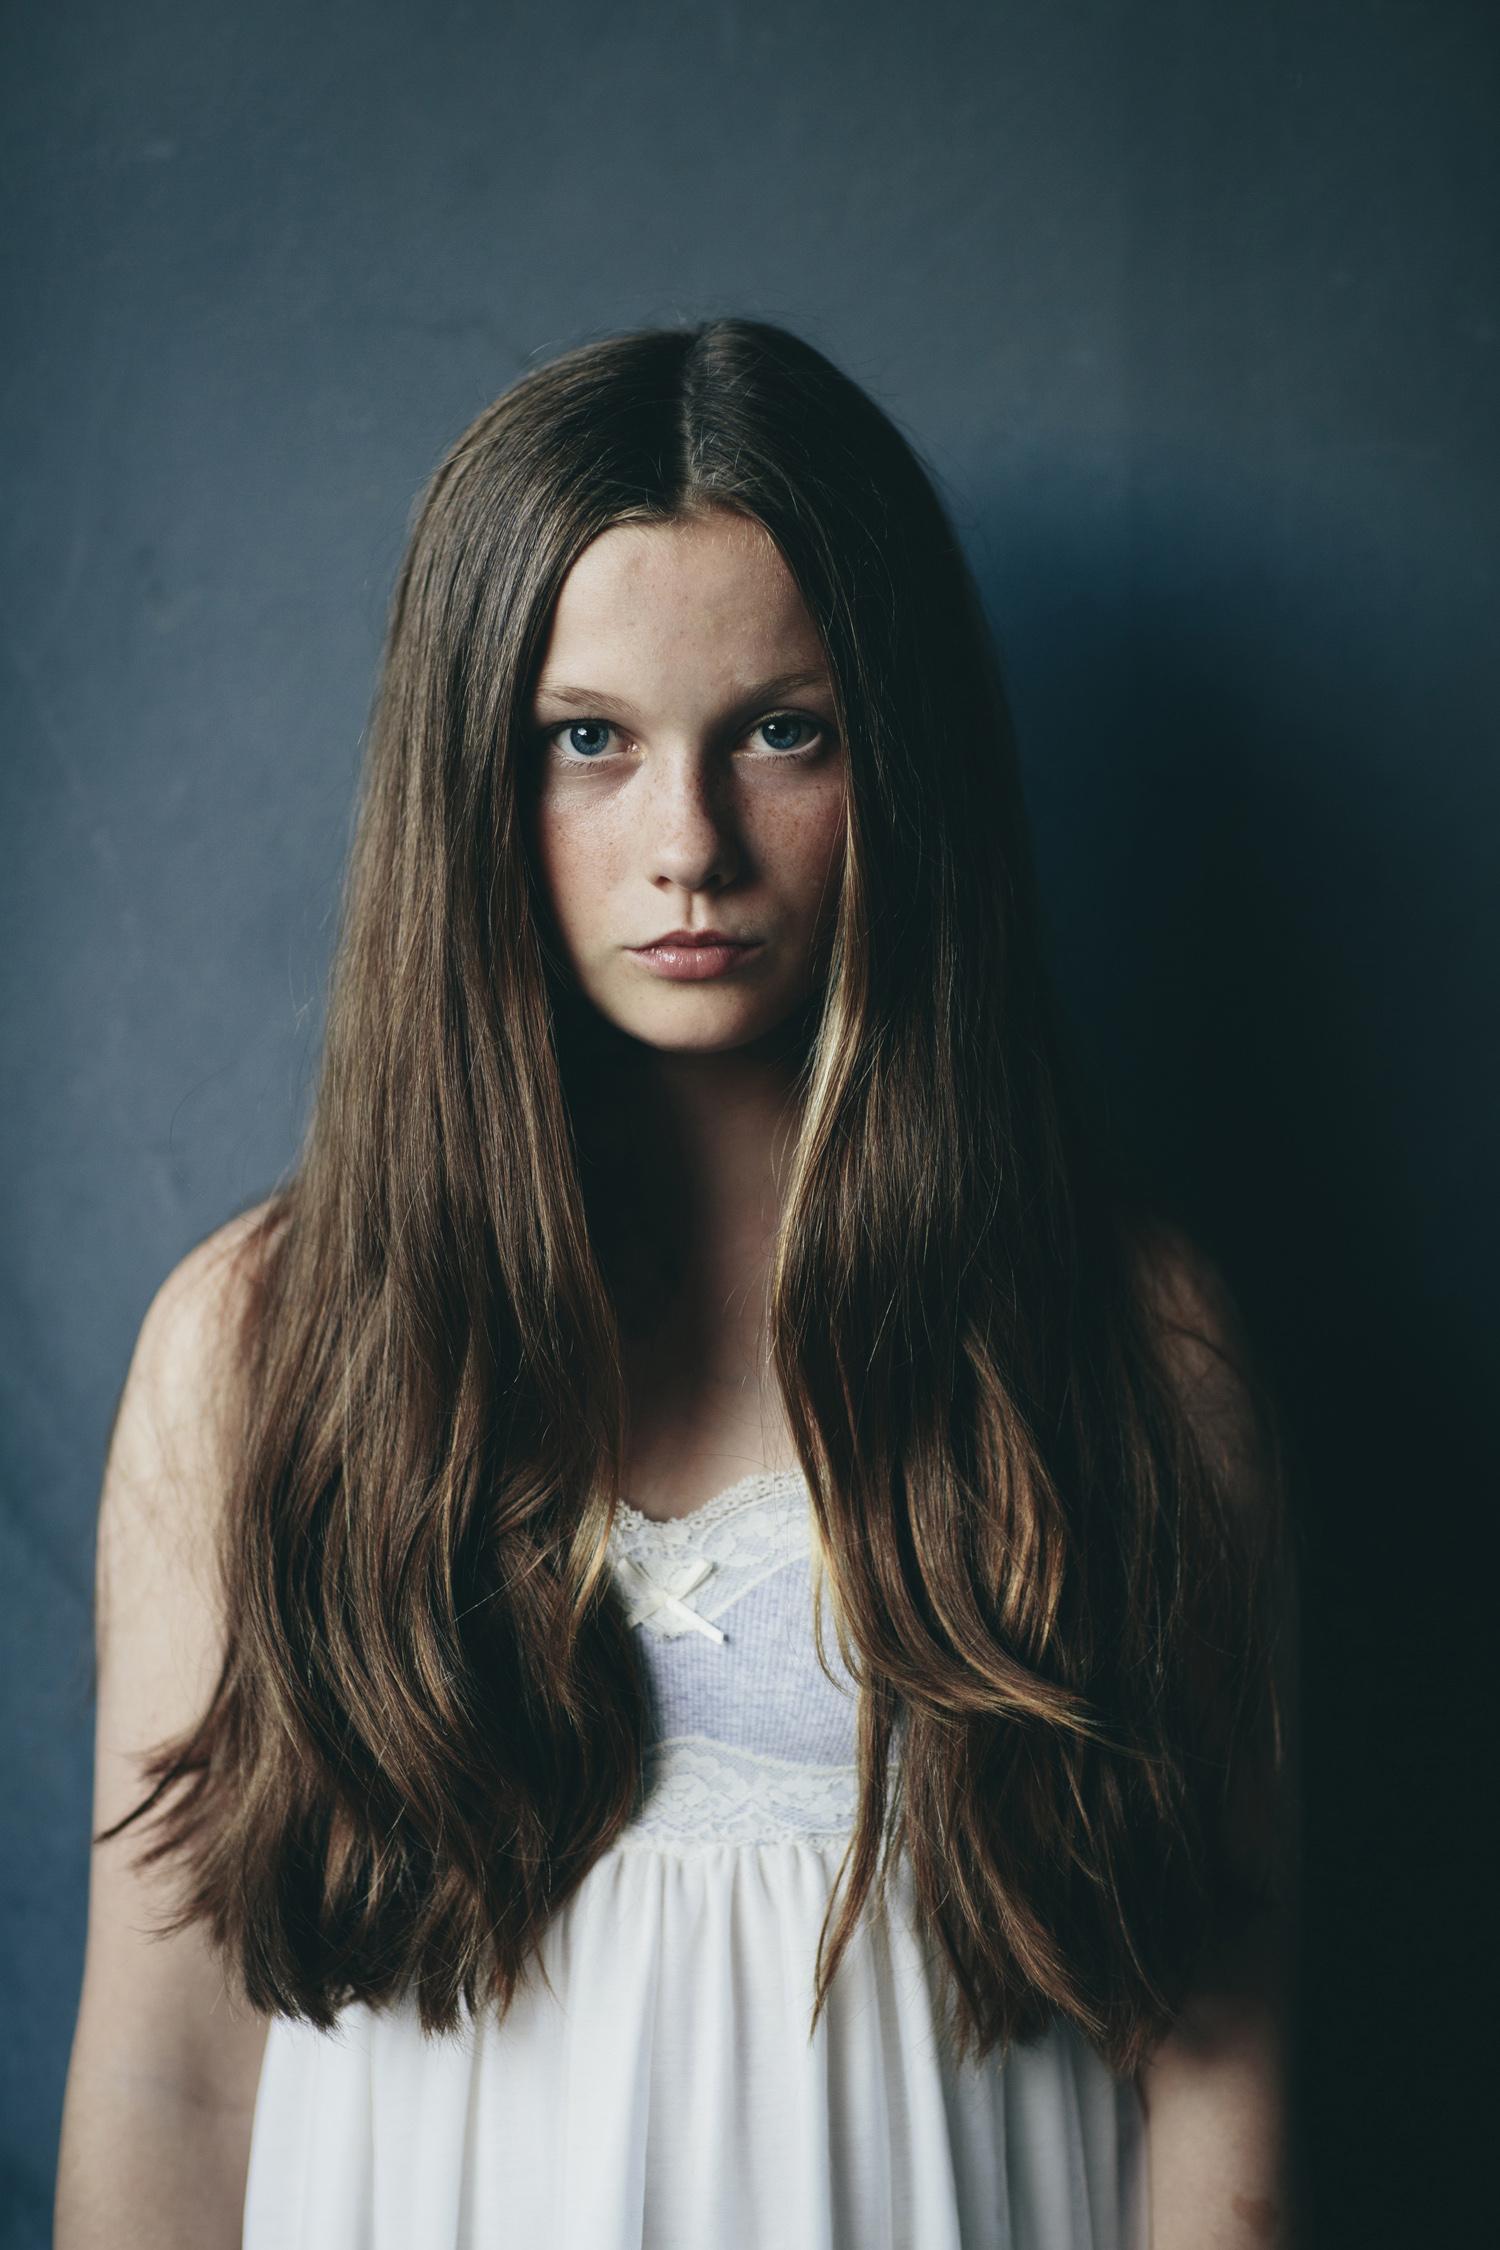 teen_portraits_sheridan_nilsson.05.jpg